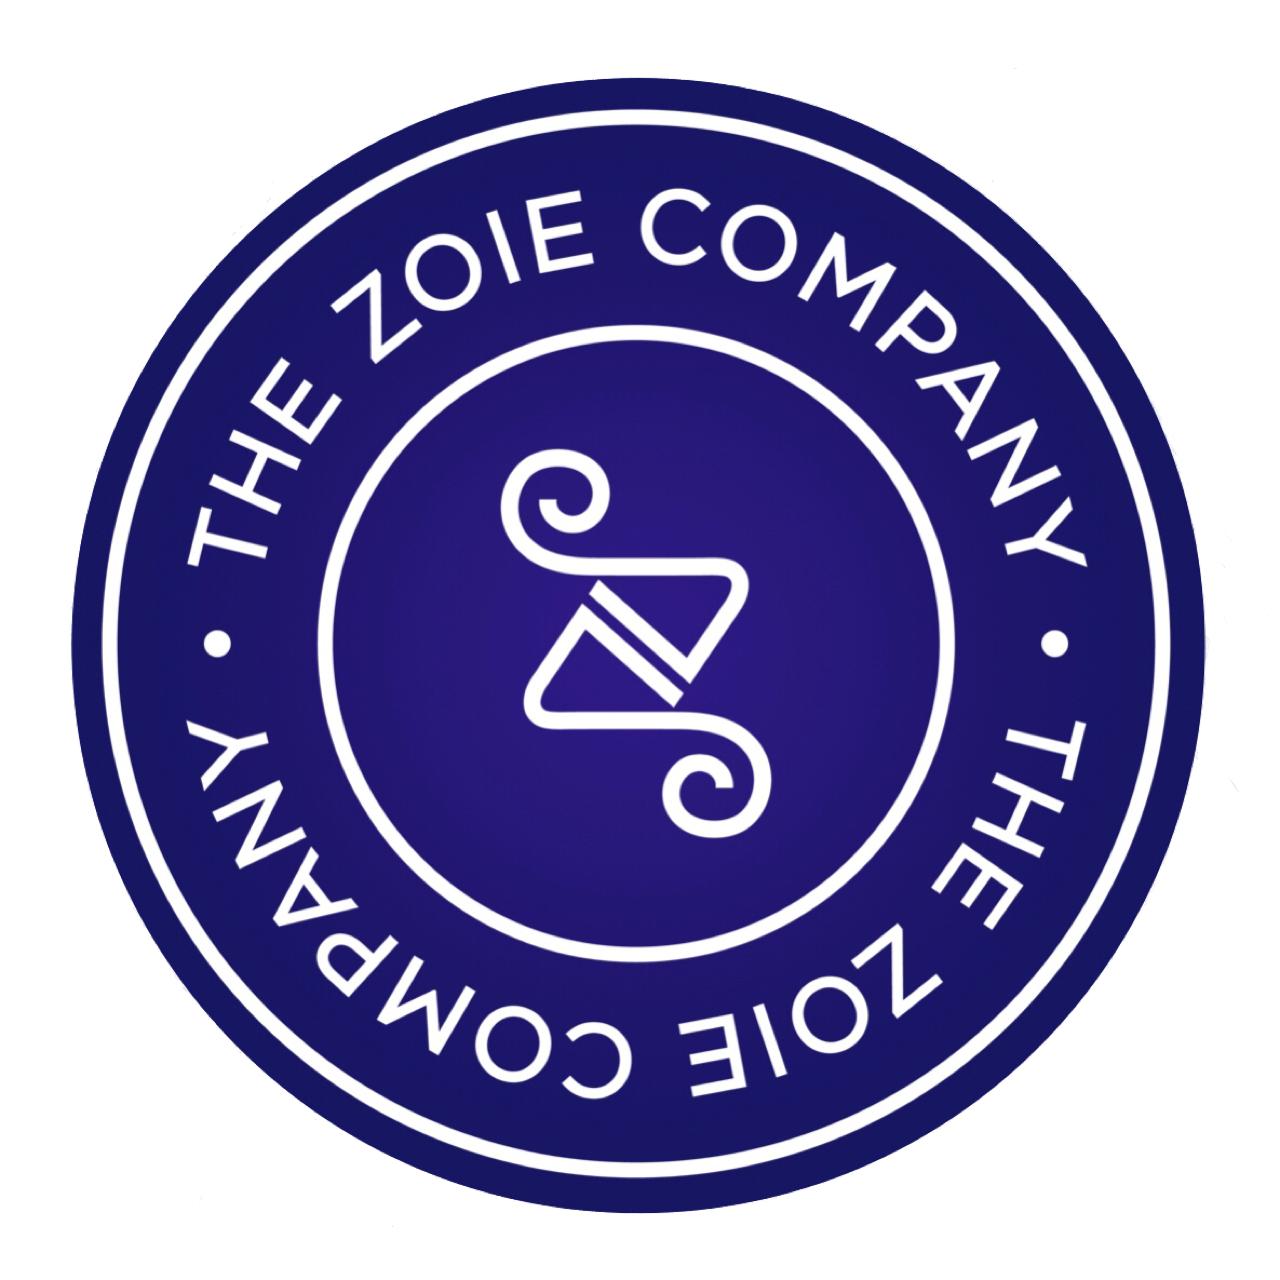 The Zoie Company